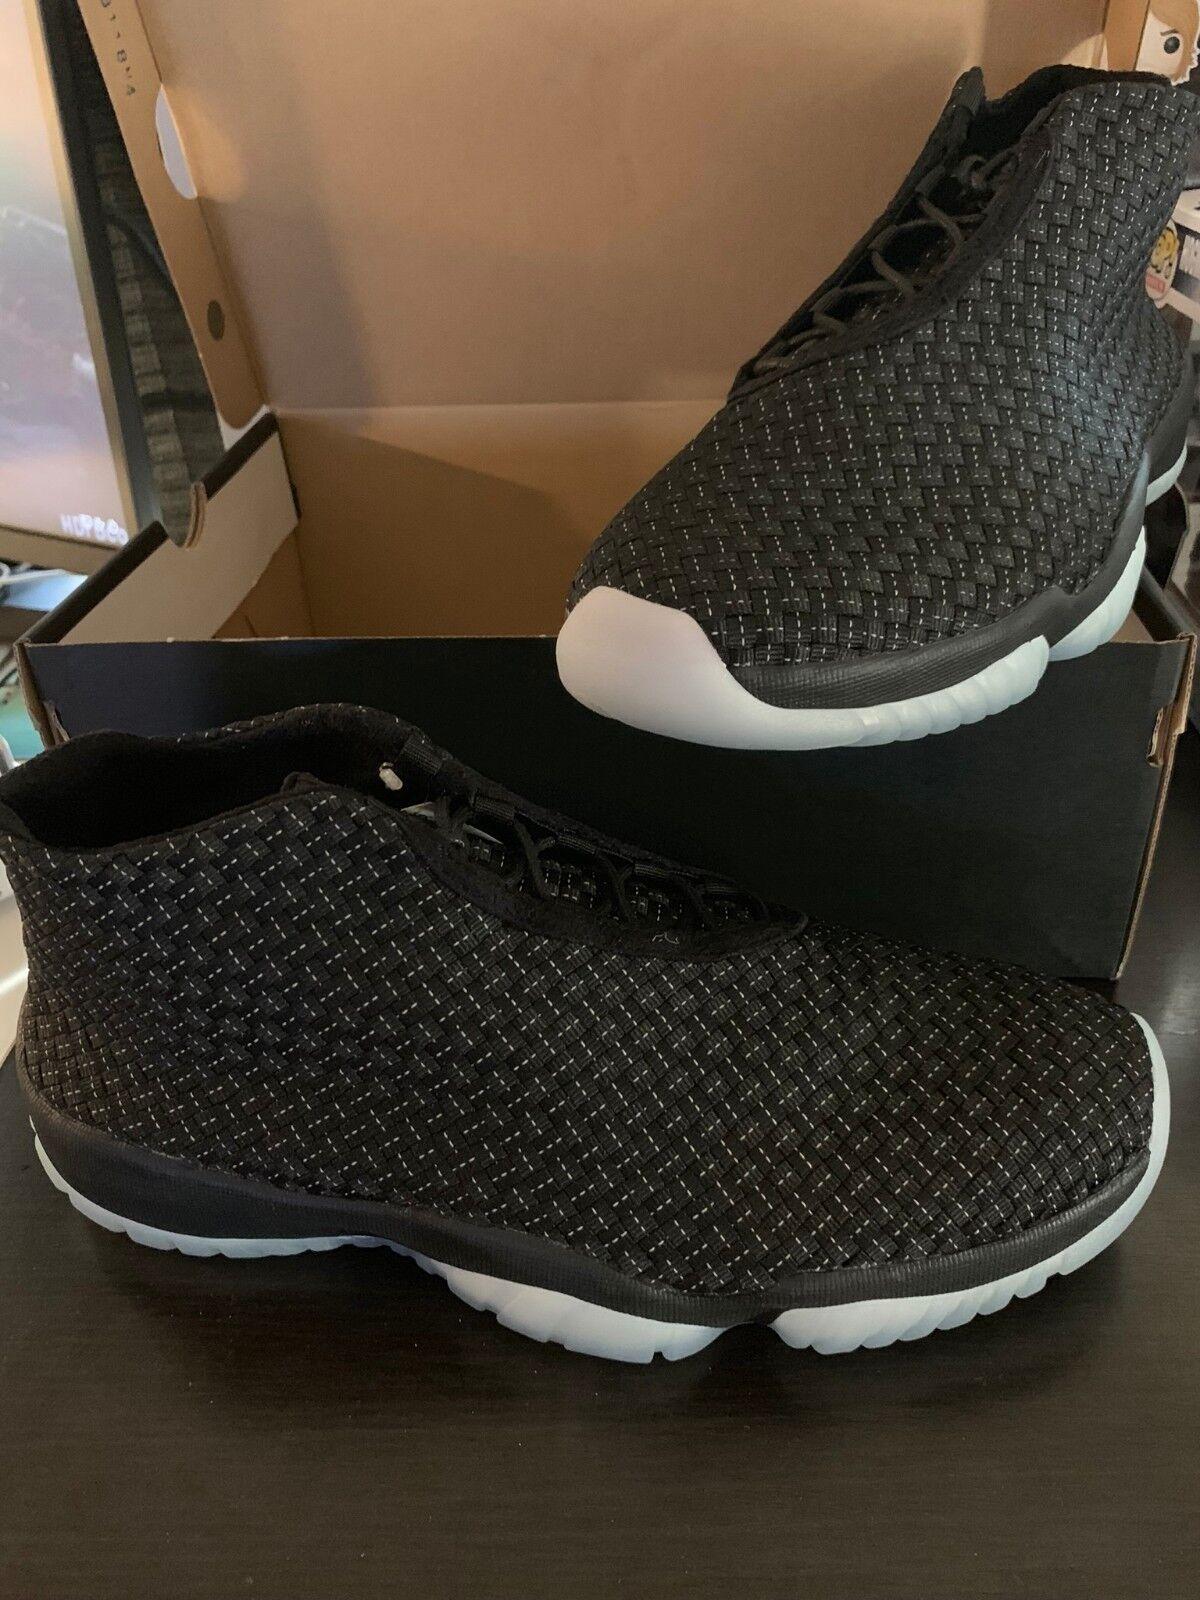 Nike Air Max 90 Ultra 2. 0 Essential Glow In The Dark Black Mint Foam 875695 009 Mens Shoes Sportswear 875695 009